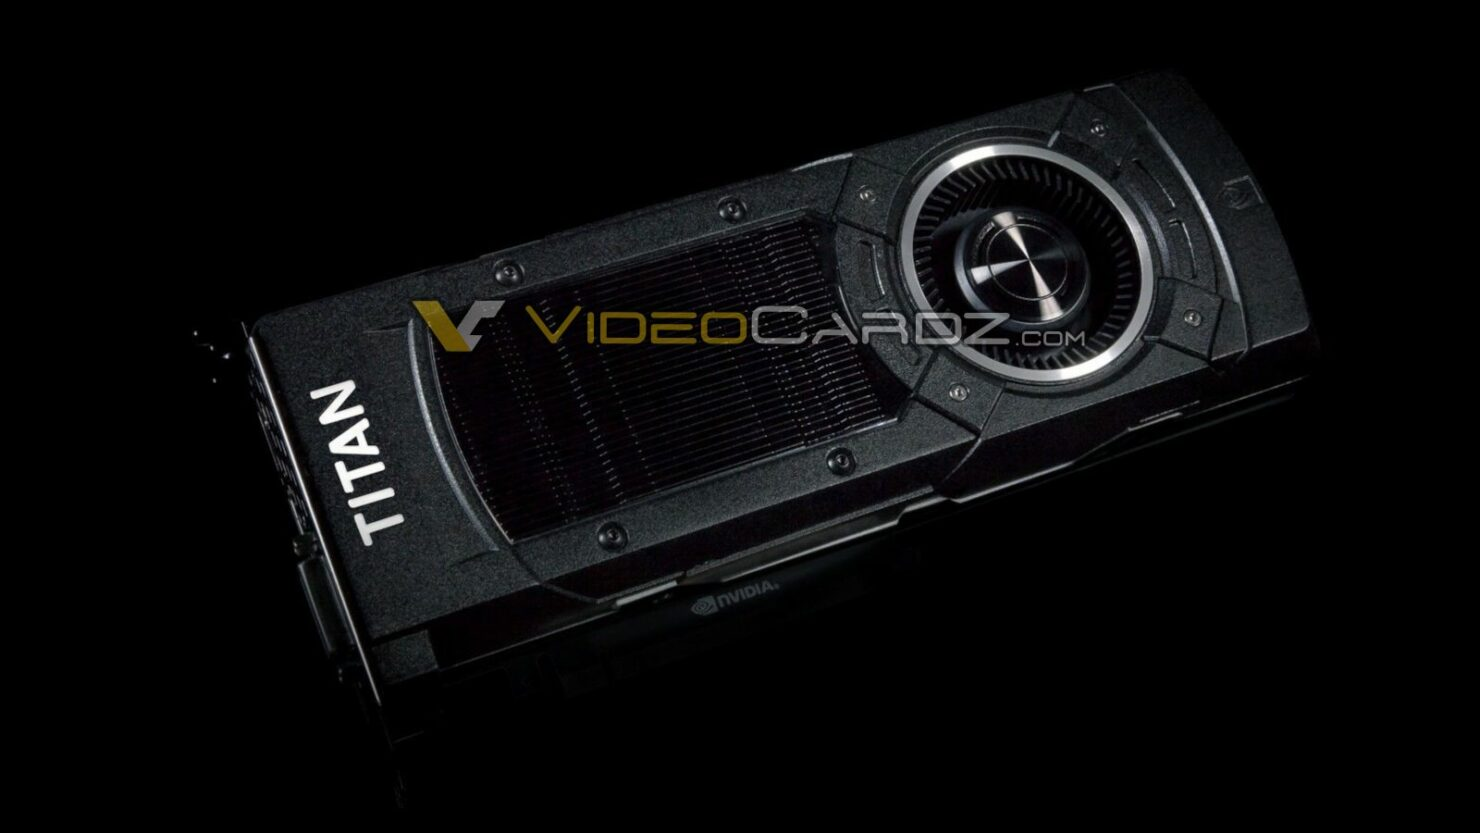 nvidia-geforce-gtx-titan-x_beauty-shots_2